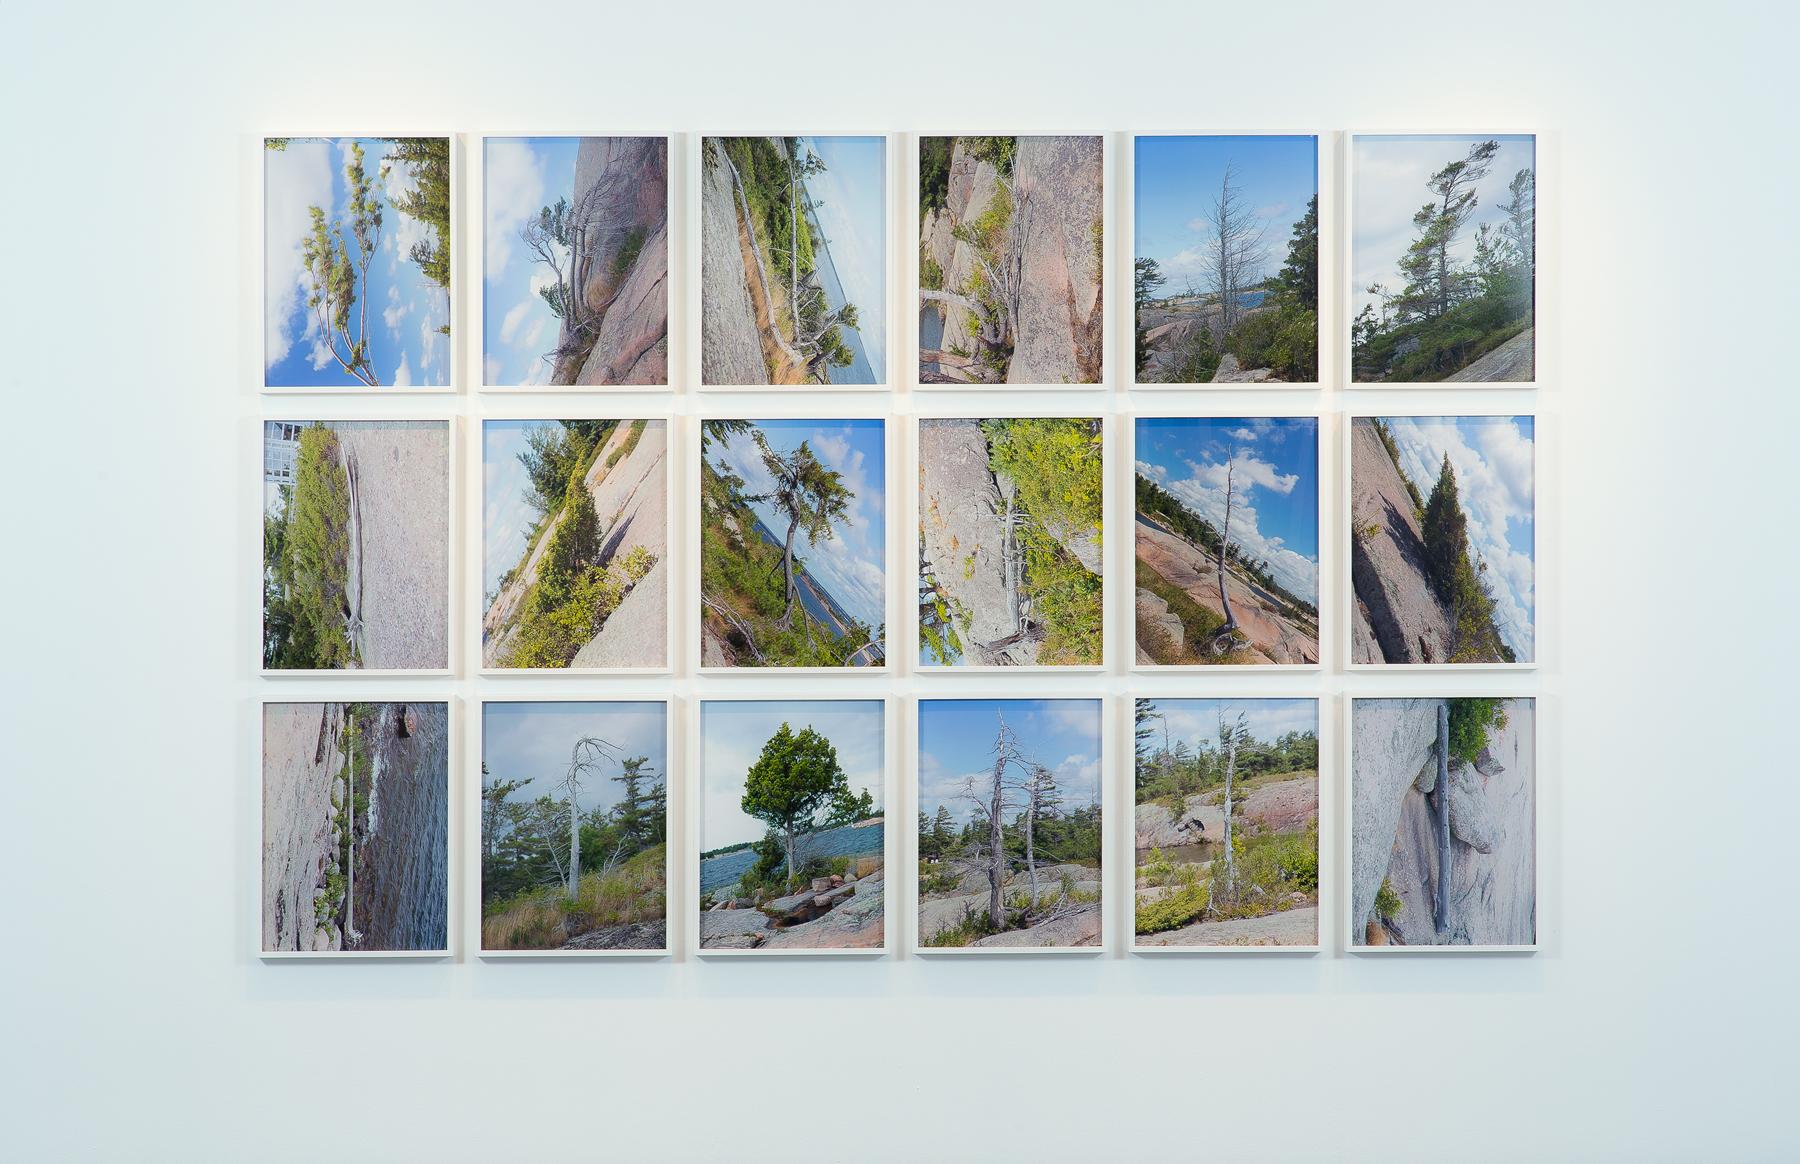 Tree Corrections, 2013, 18 Chromogenic Prints, 18x24 inches each